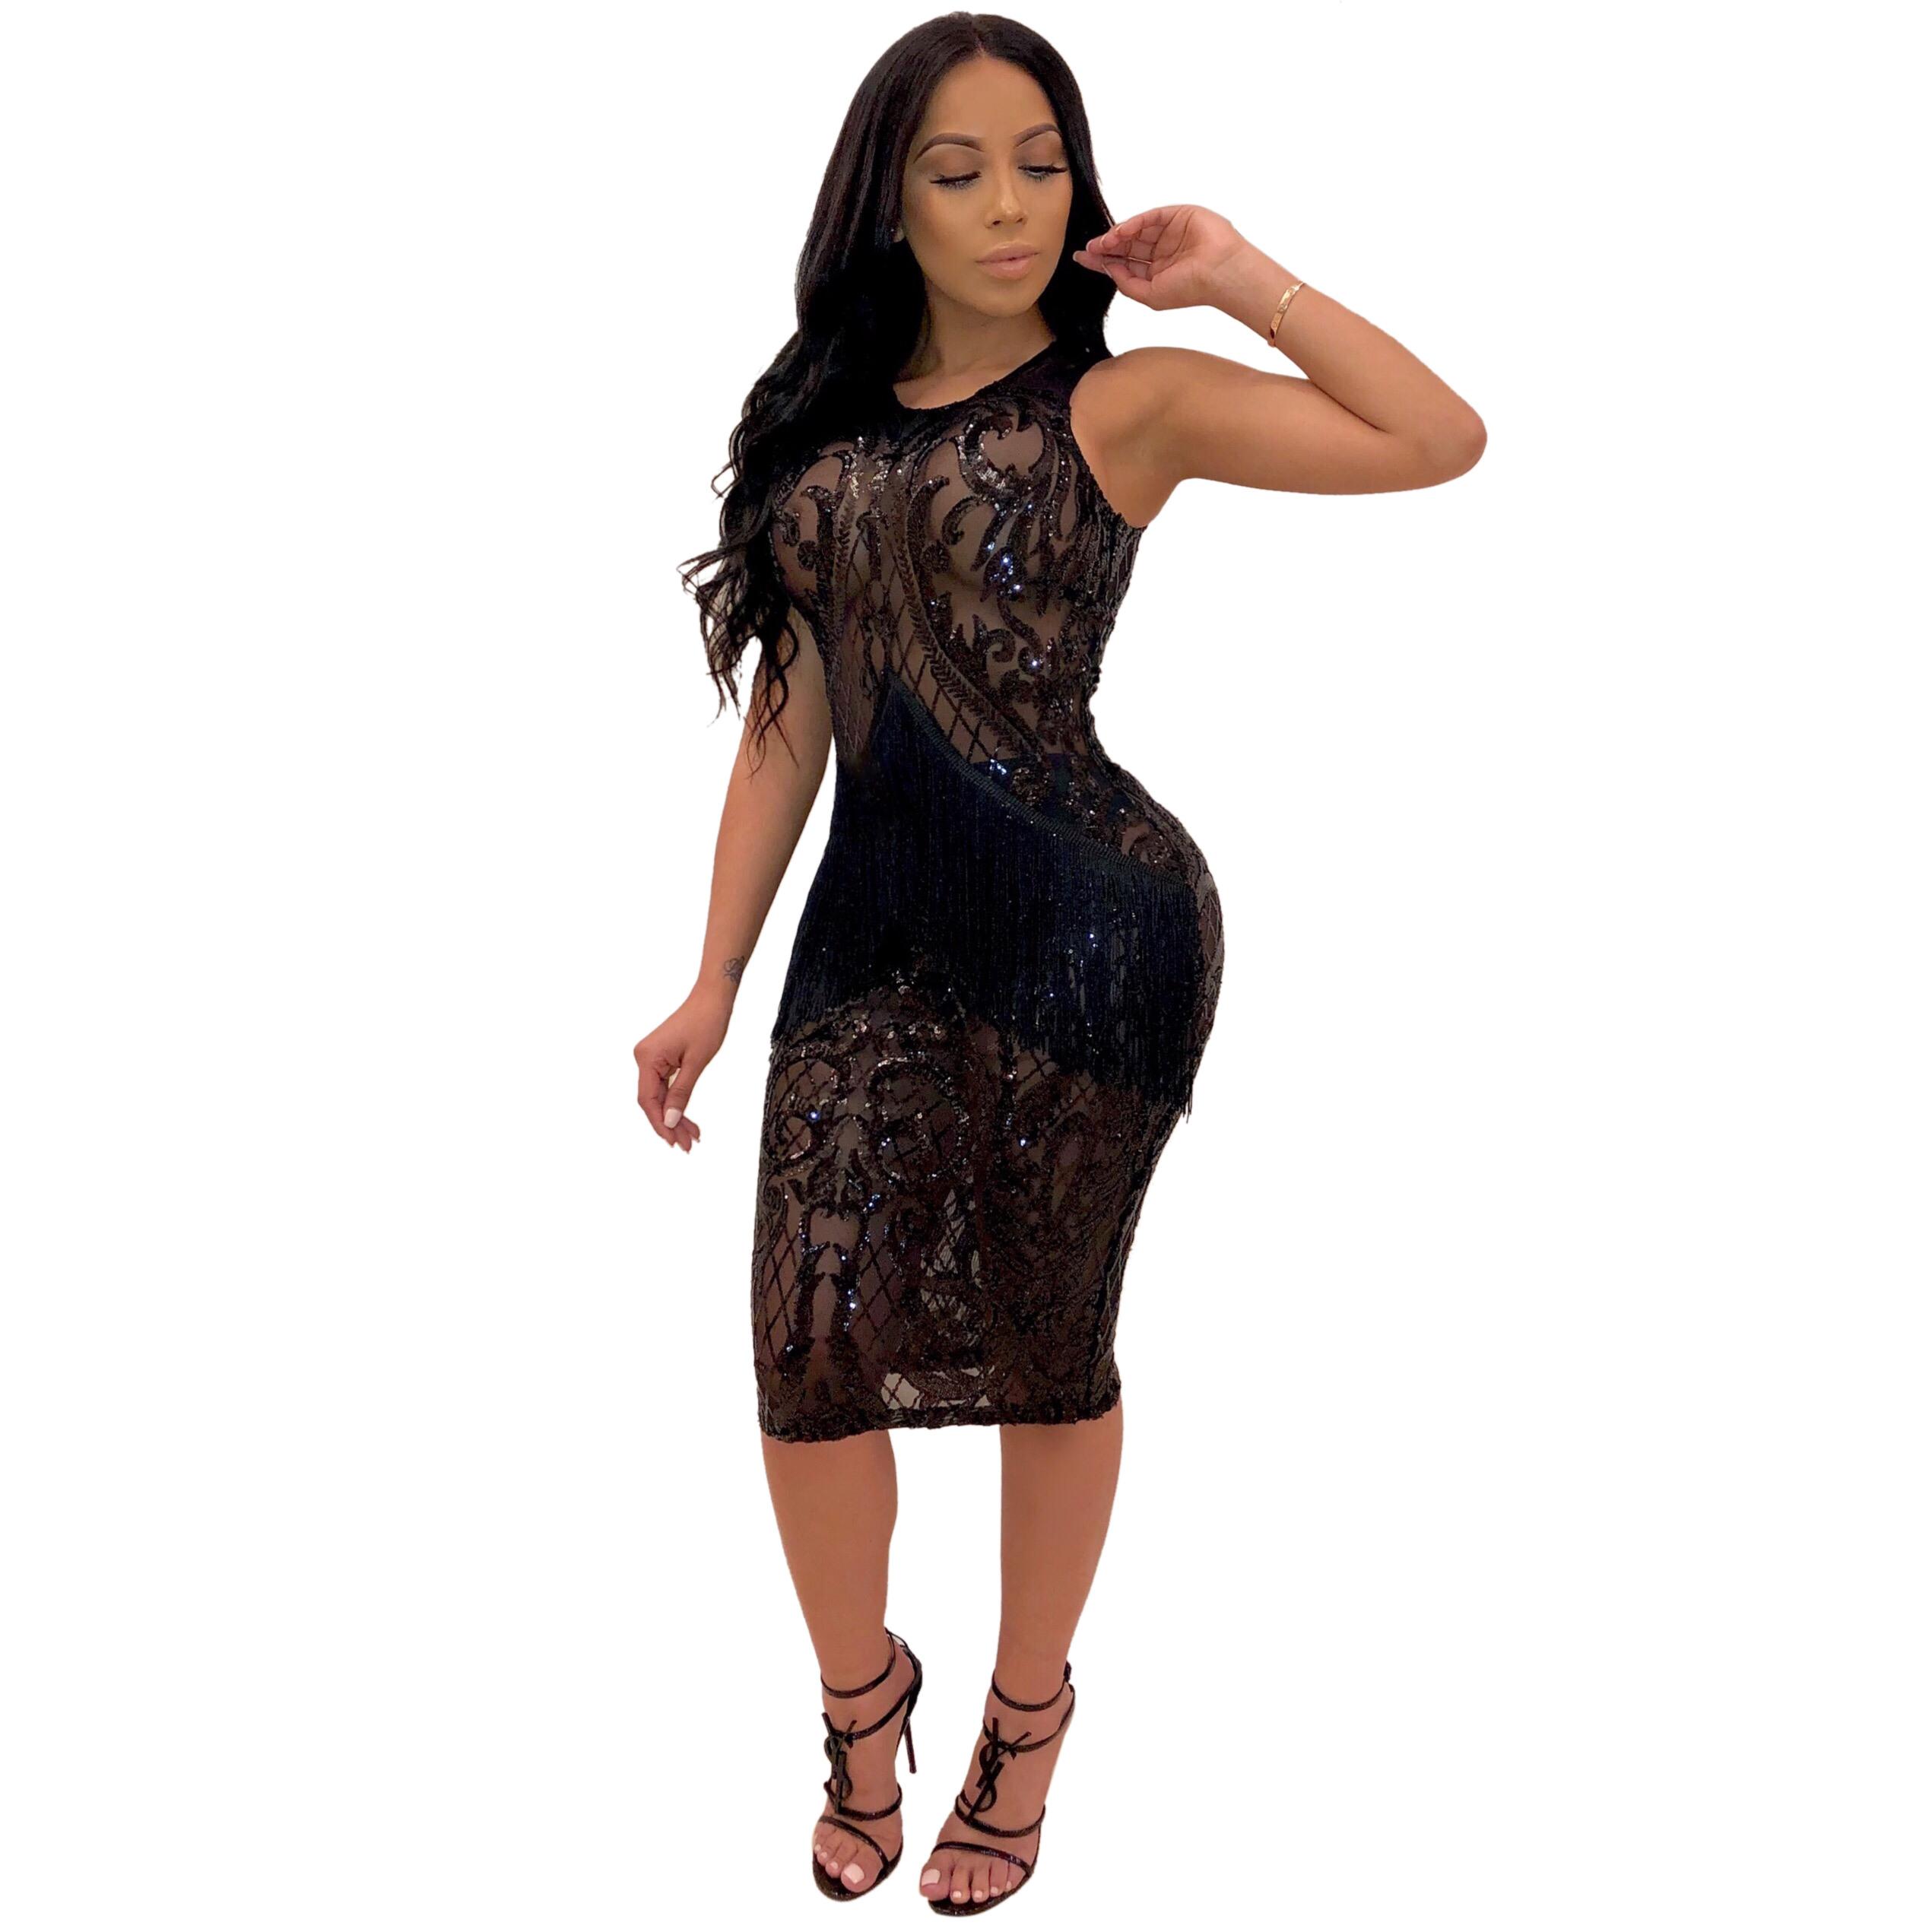 20 Cool Abendkleid Figurbetont Boutique15 Kreativ Abendkleid Figurbetont für 2019